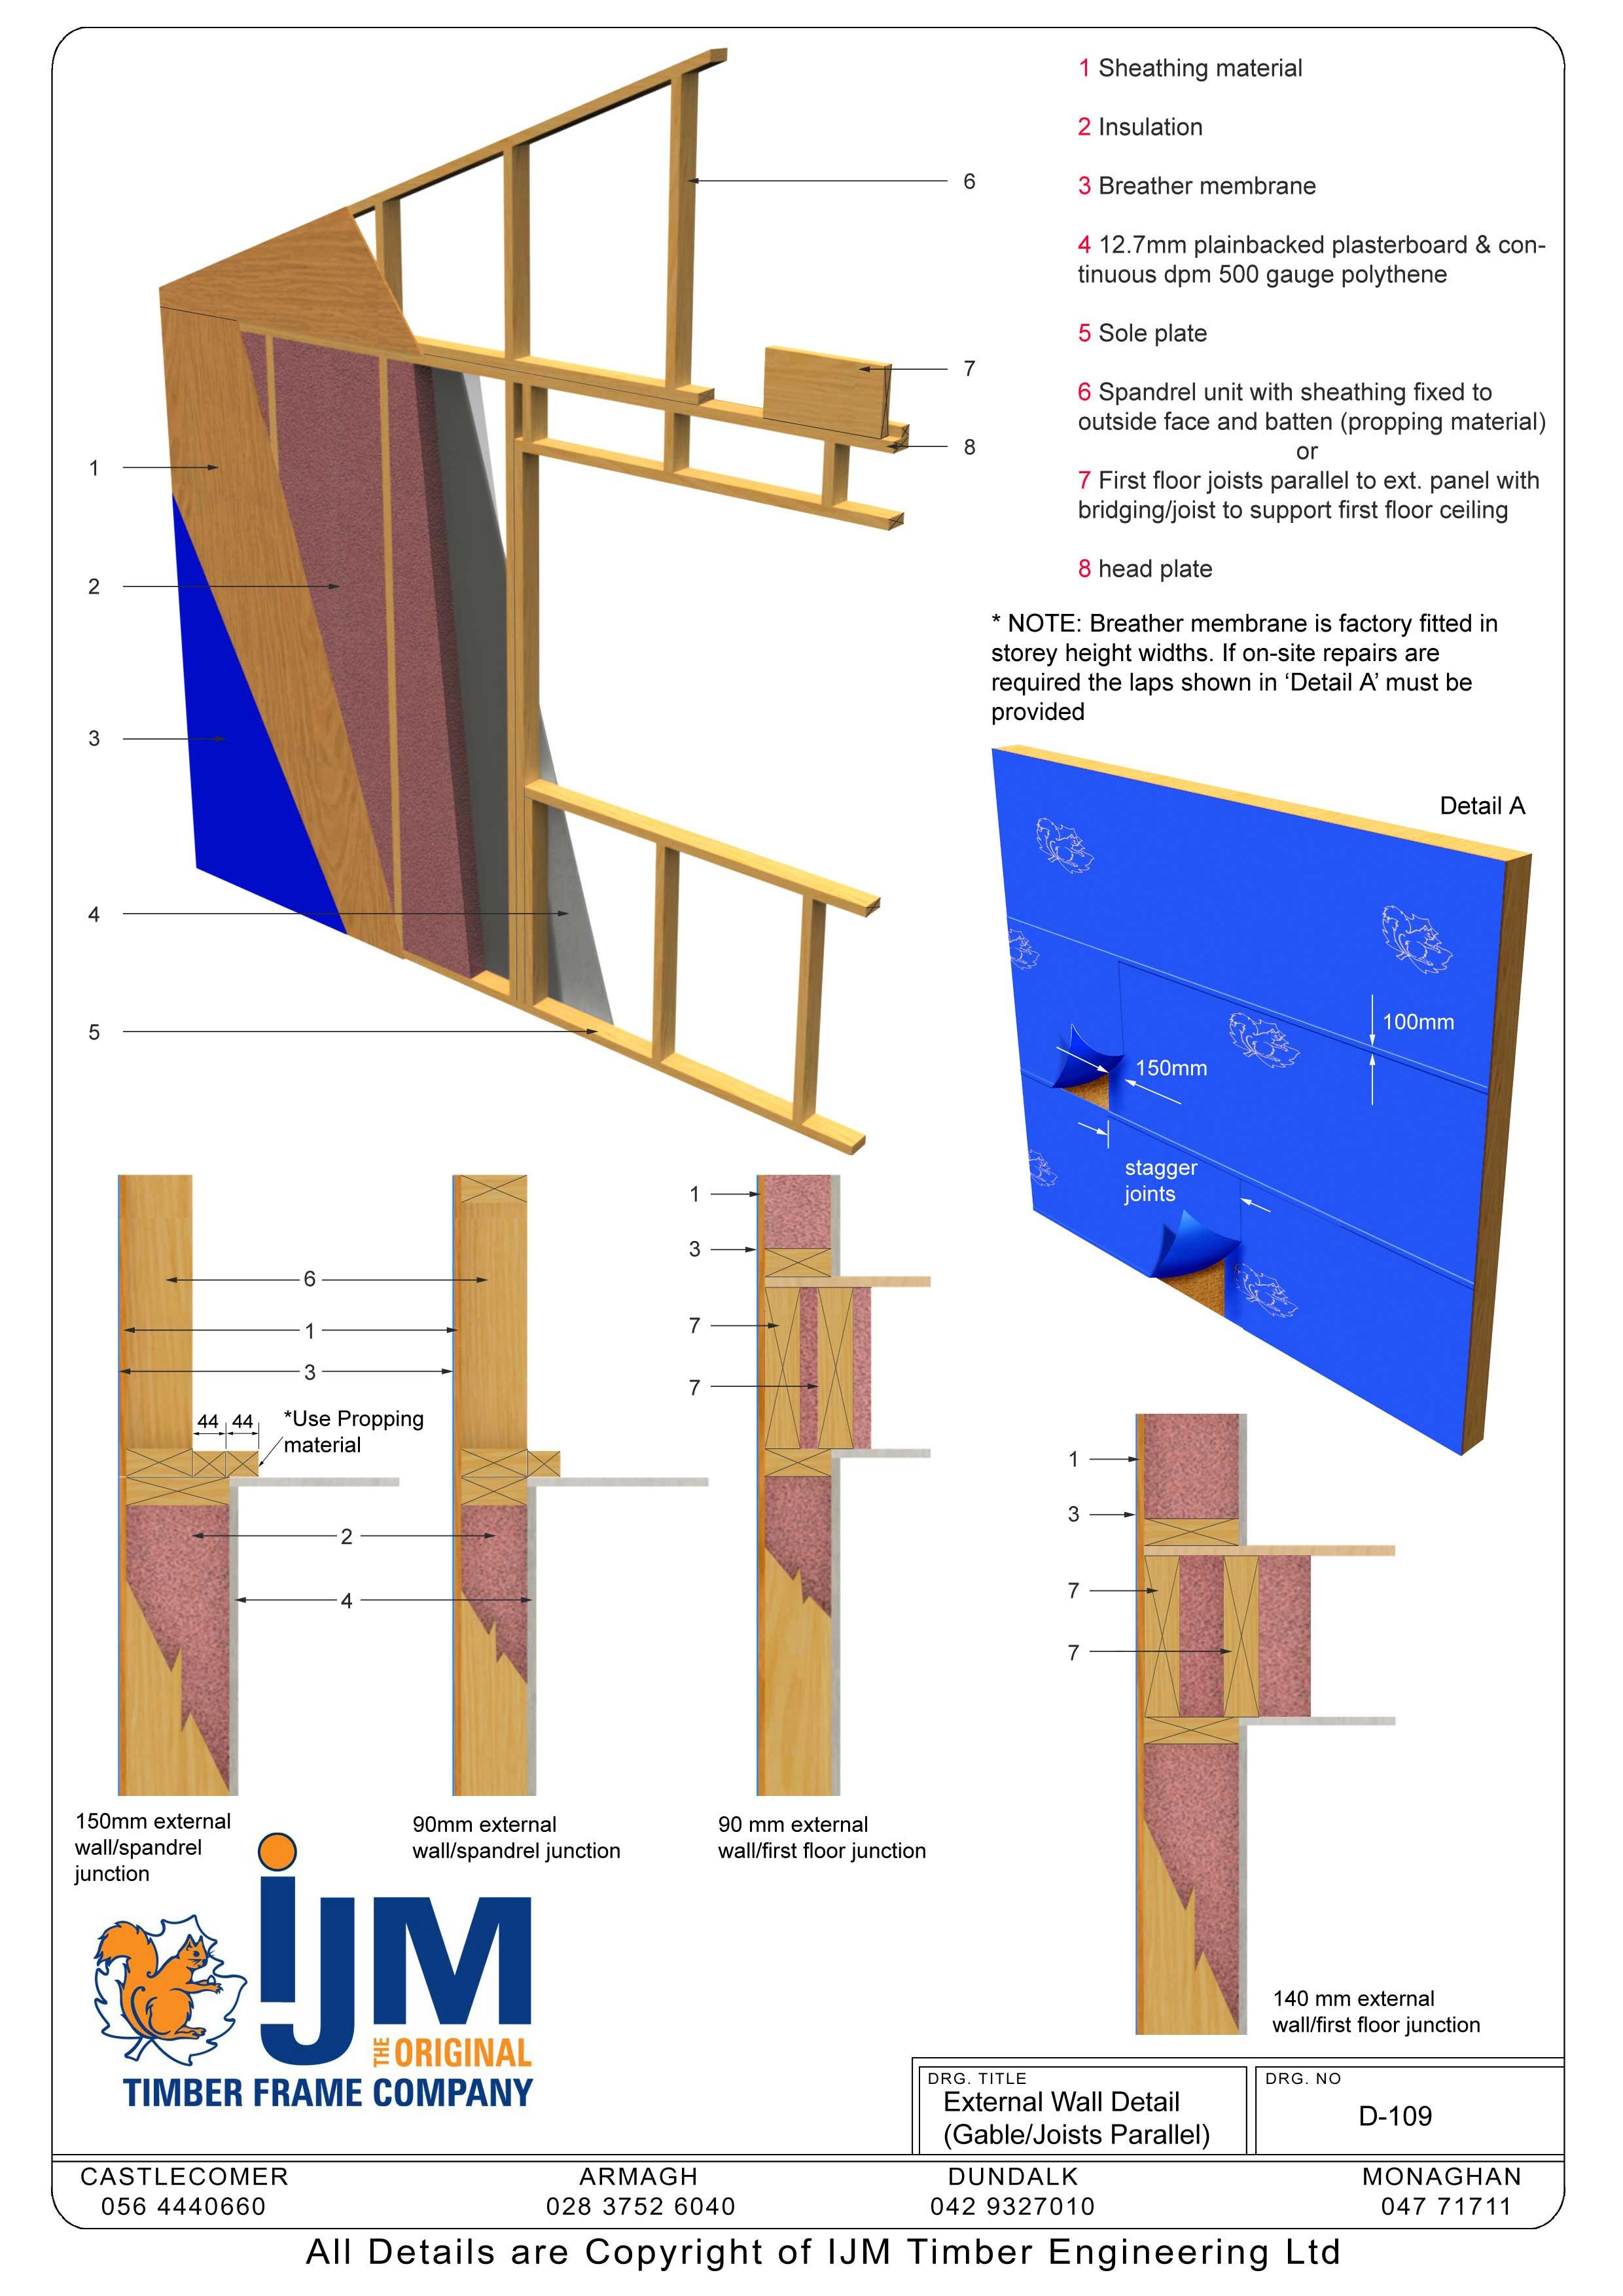 Ijm Timberframe Technical Details Book Of Details